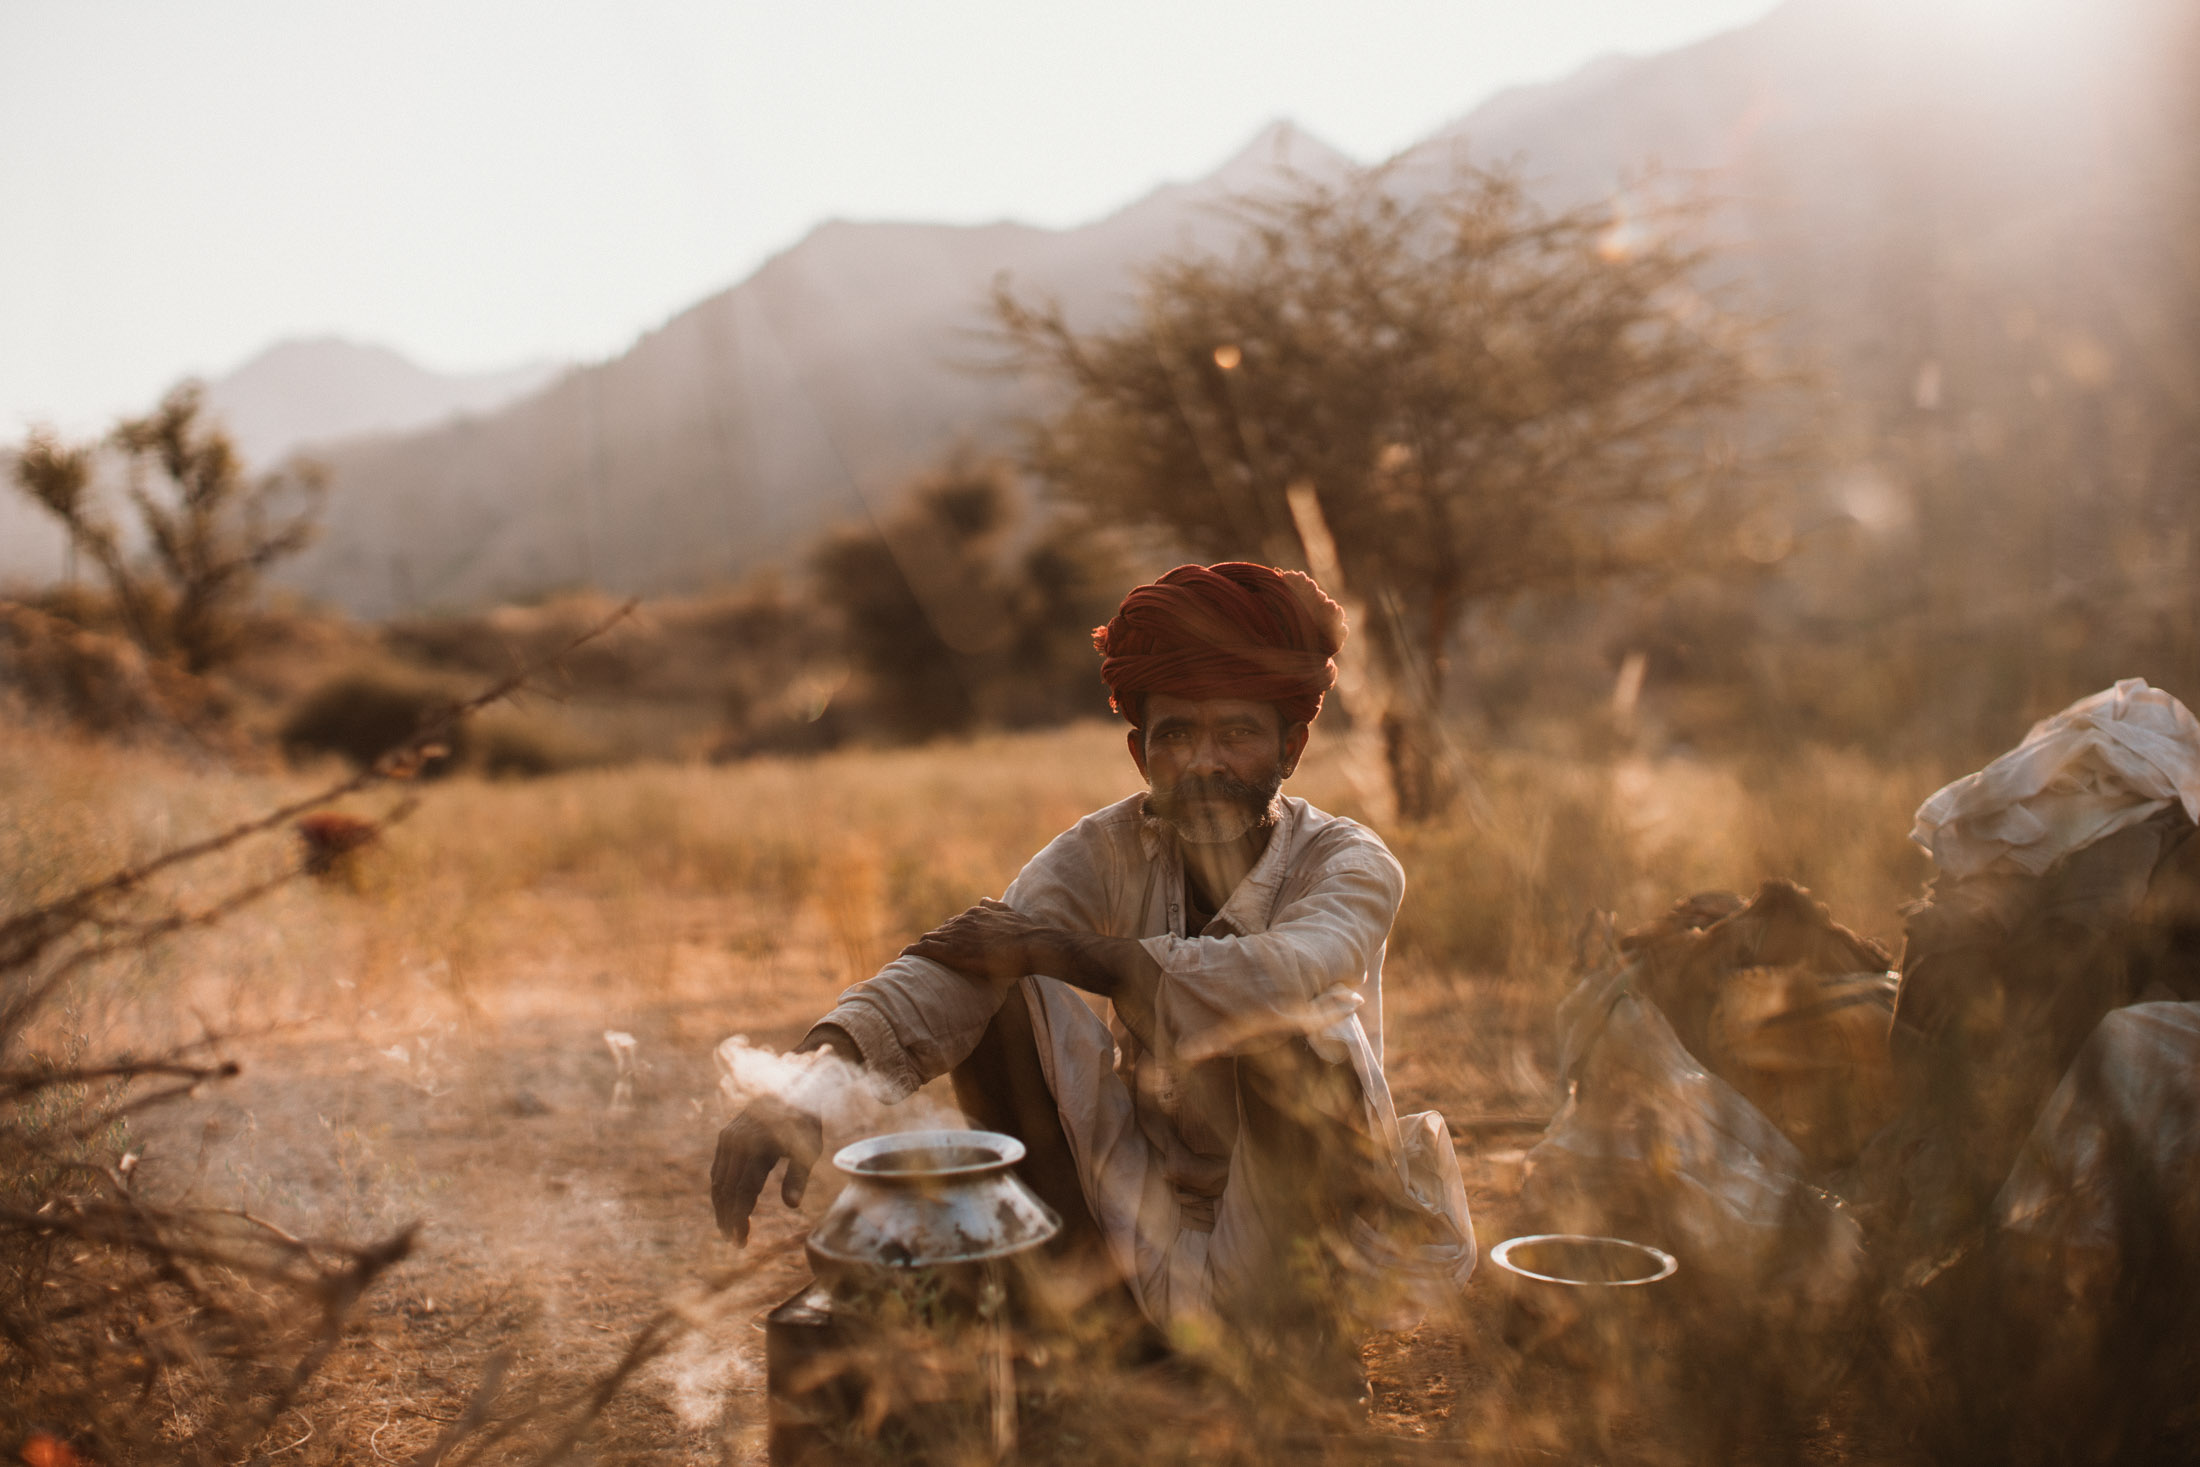 Ganesh - a Goatherd in the rural region near Ajmer, Rajasthan India